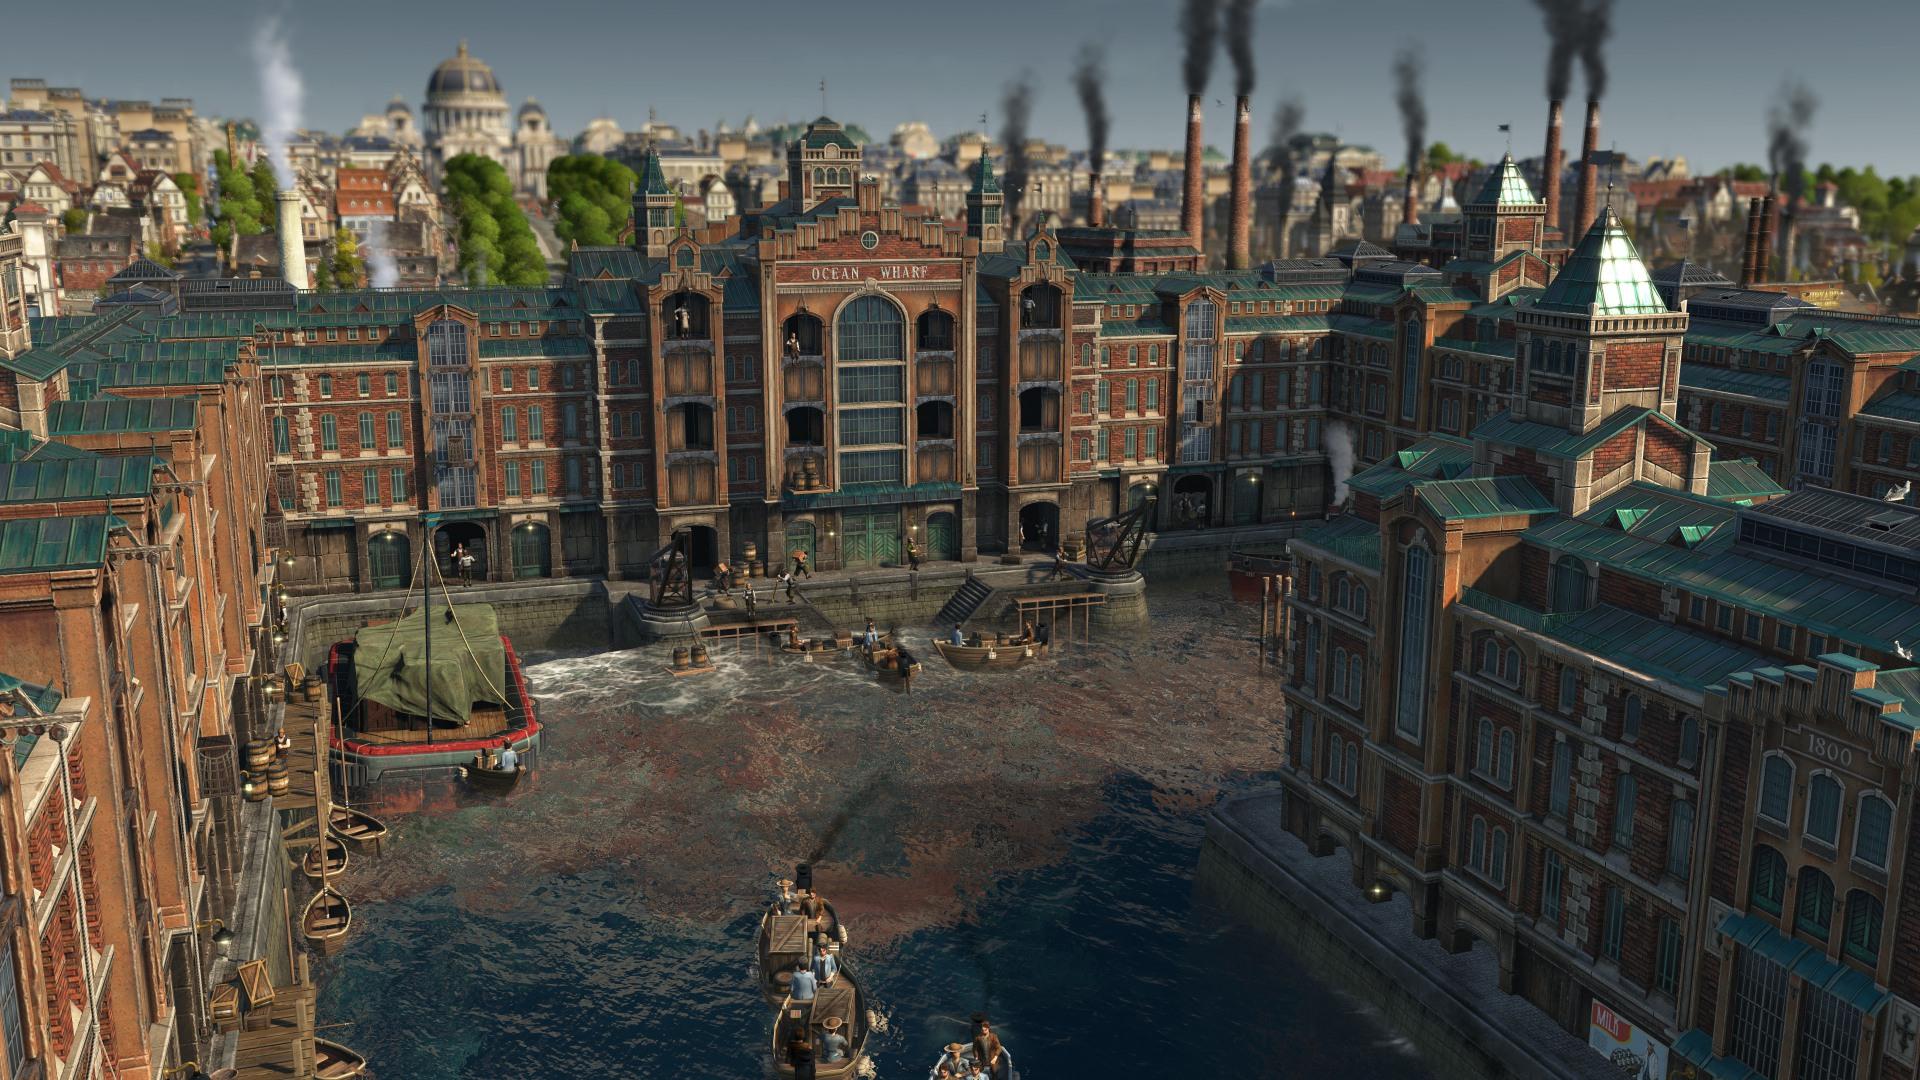 Anno1800_DLC7_Docklands_Screenshot_1-495116033a0dc547910.52097071.jpg